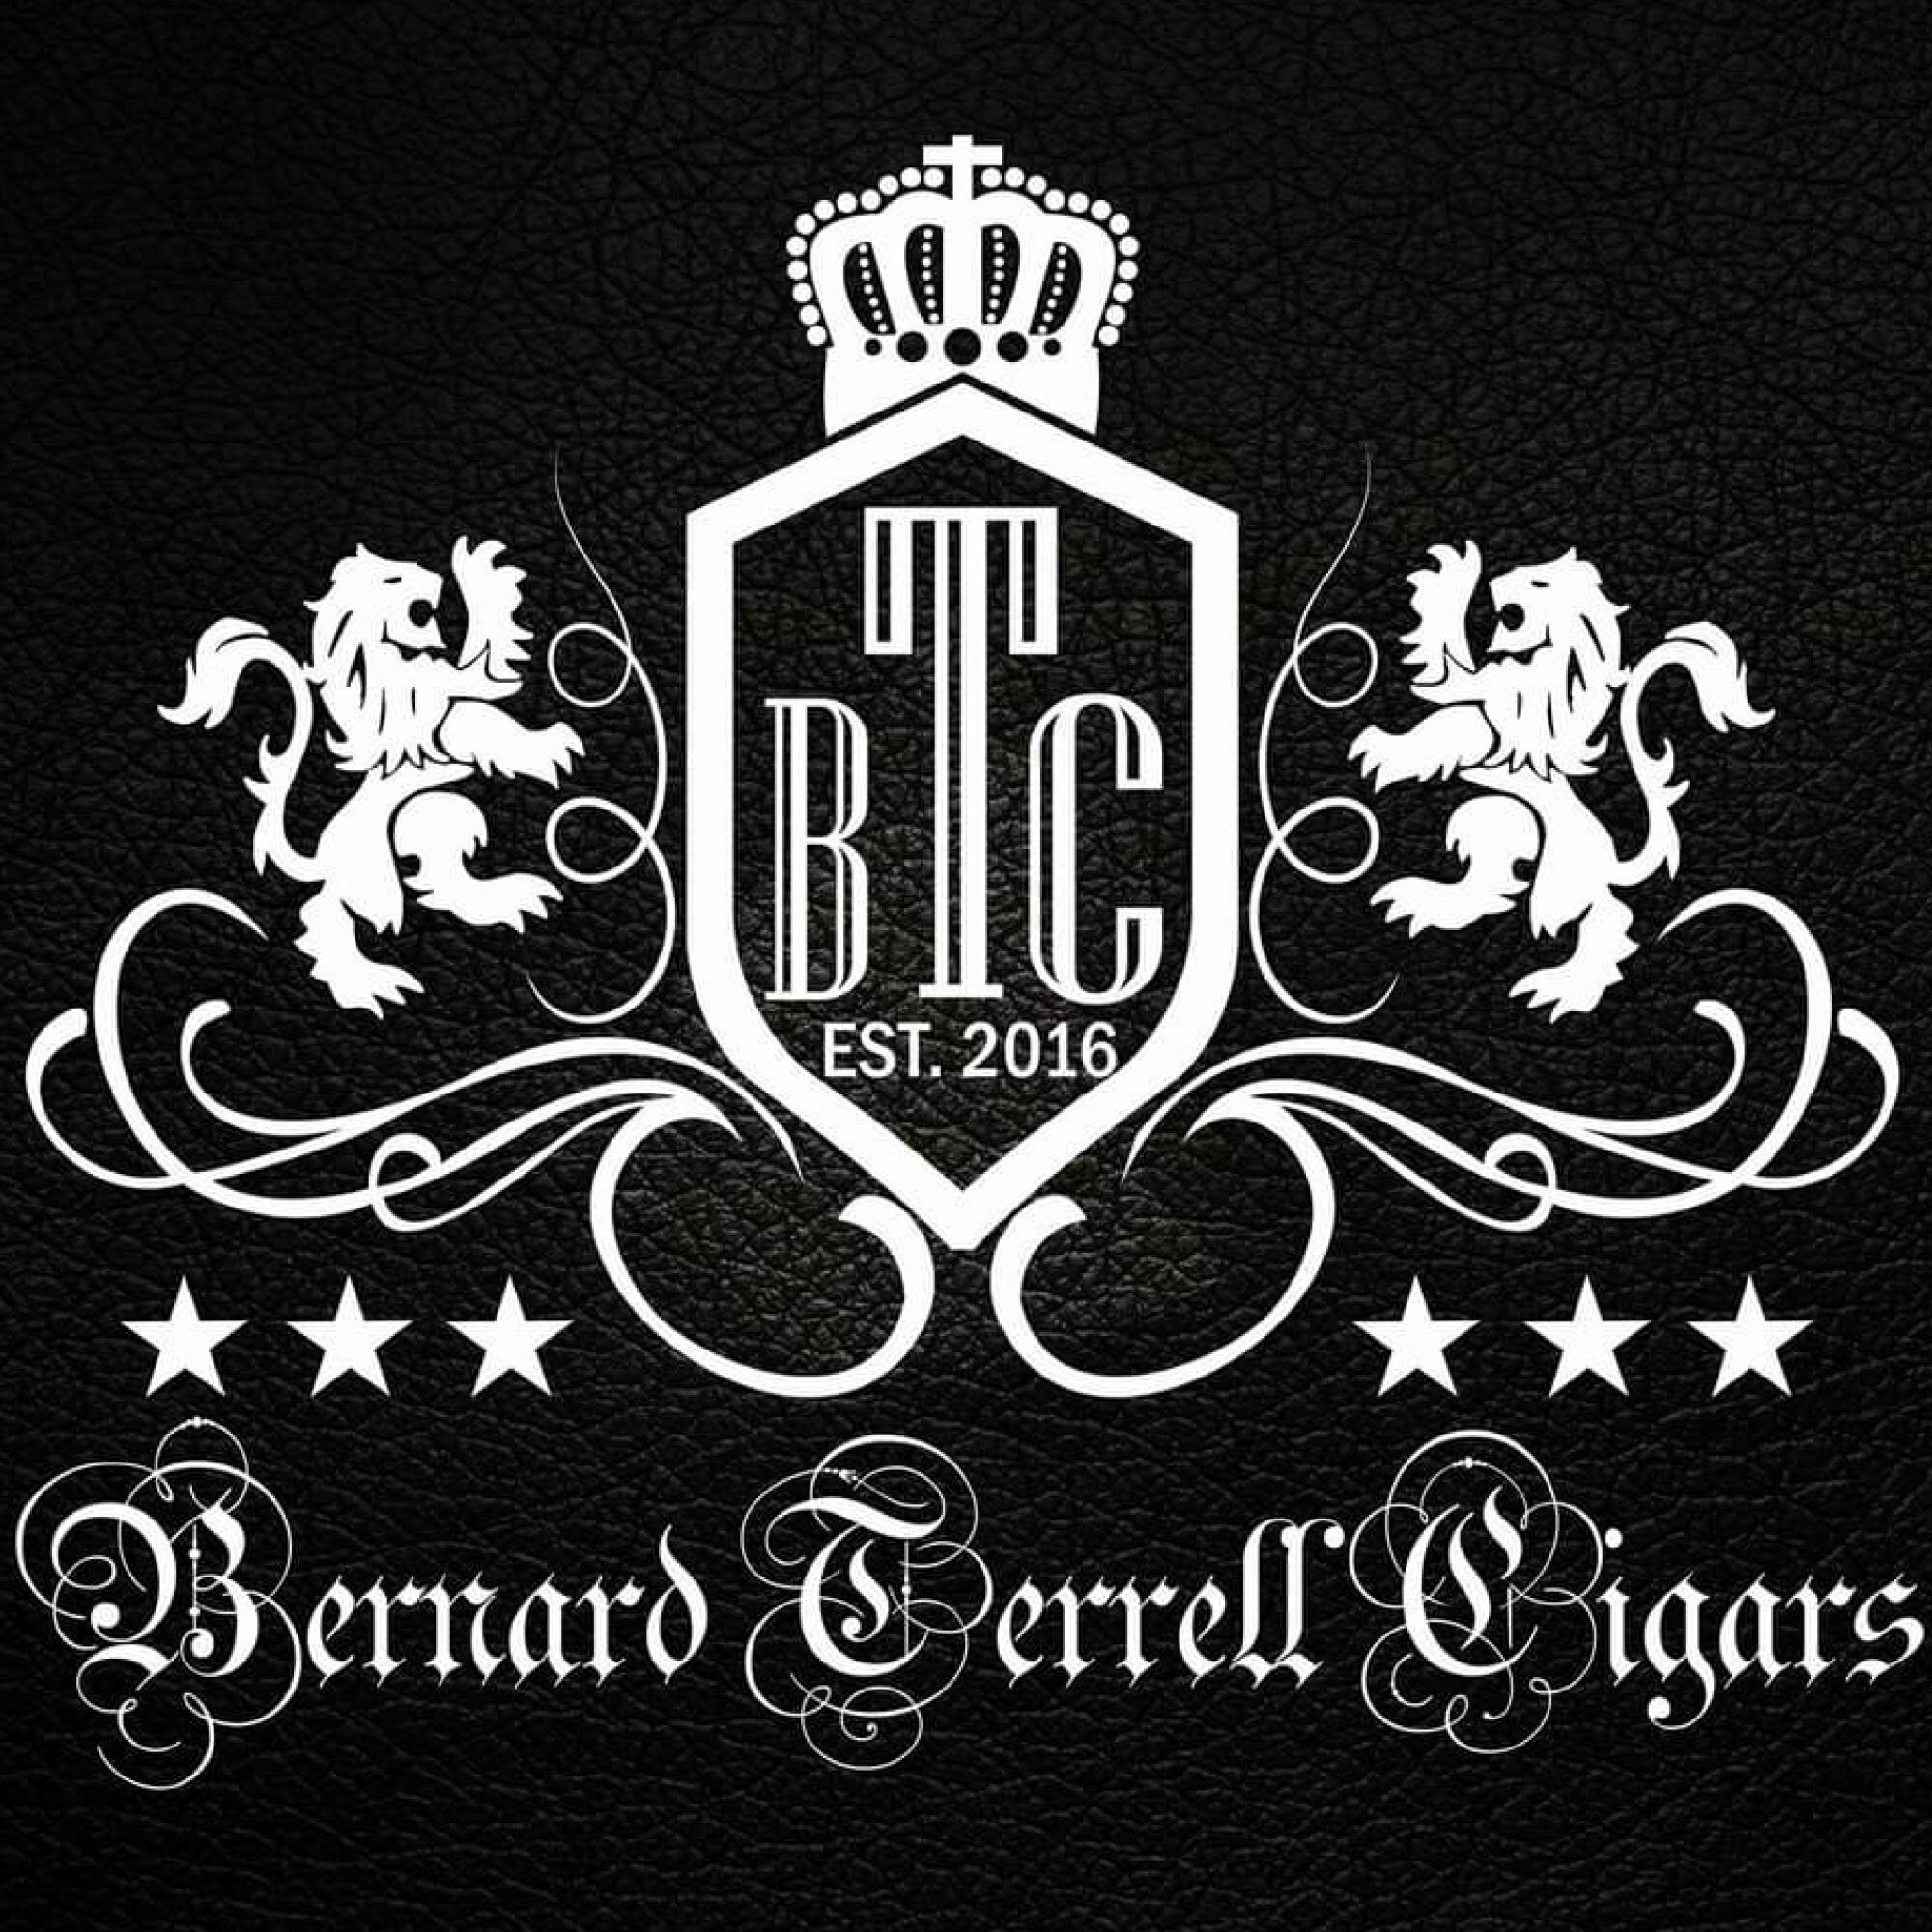 BERNARD TERRELL CIGARS